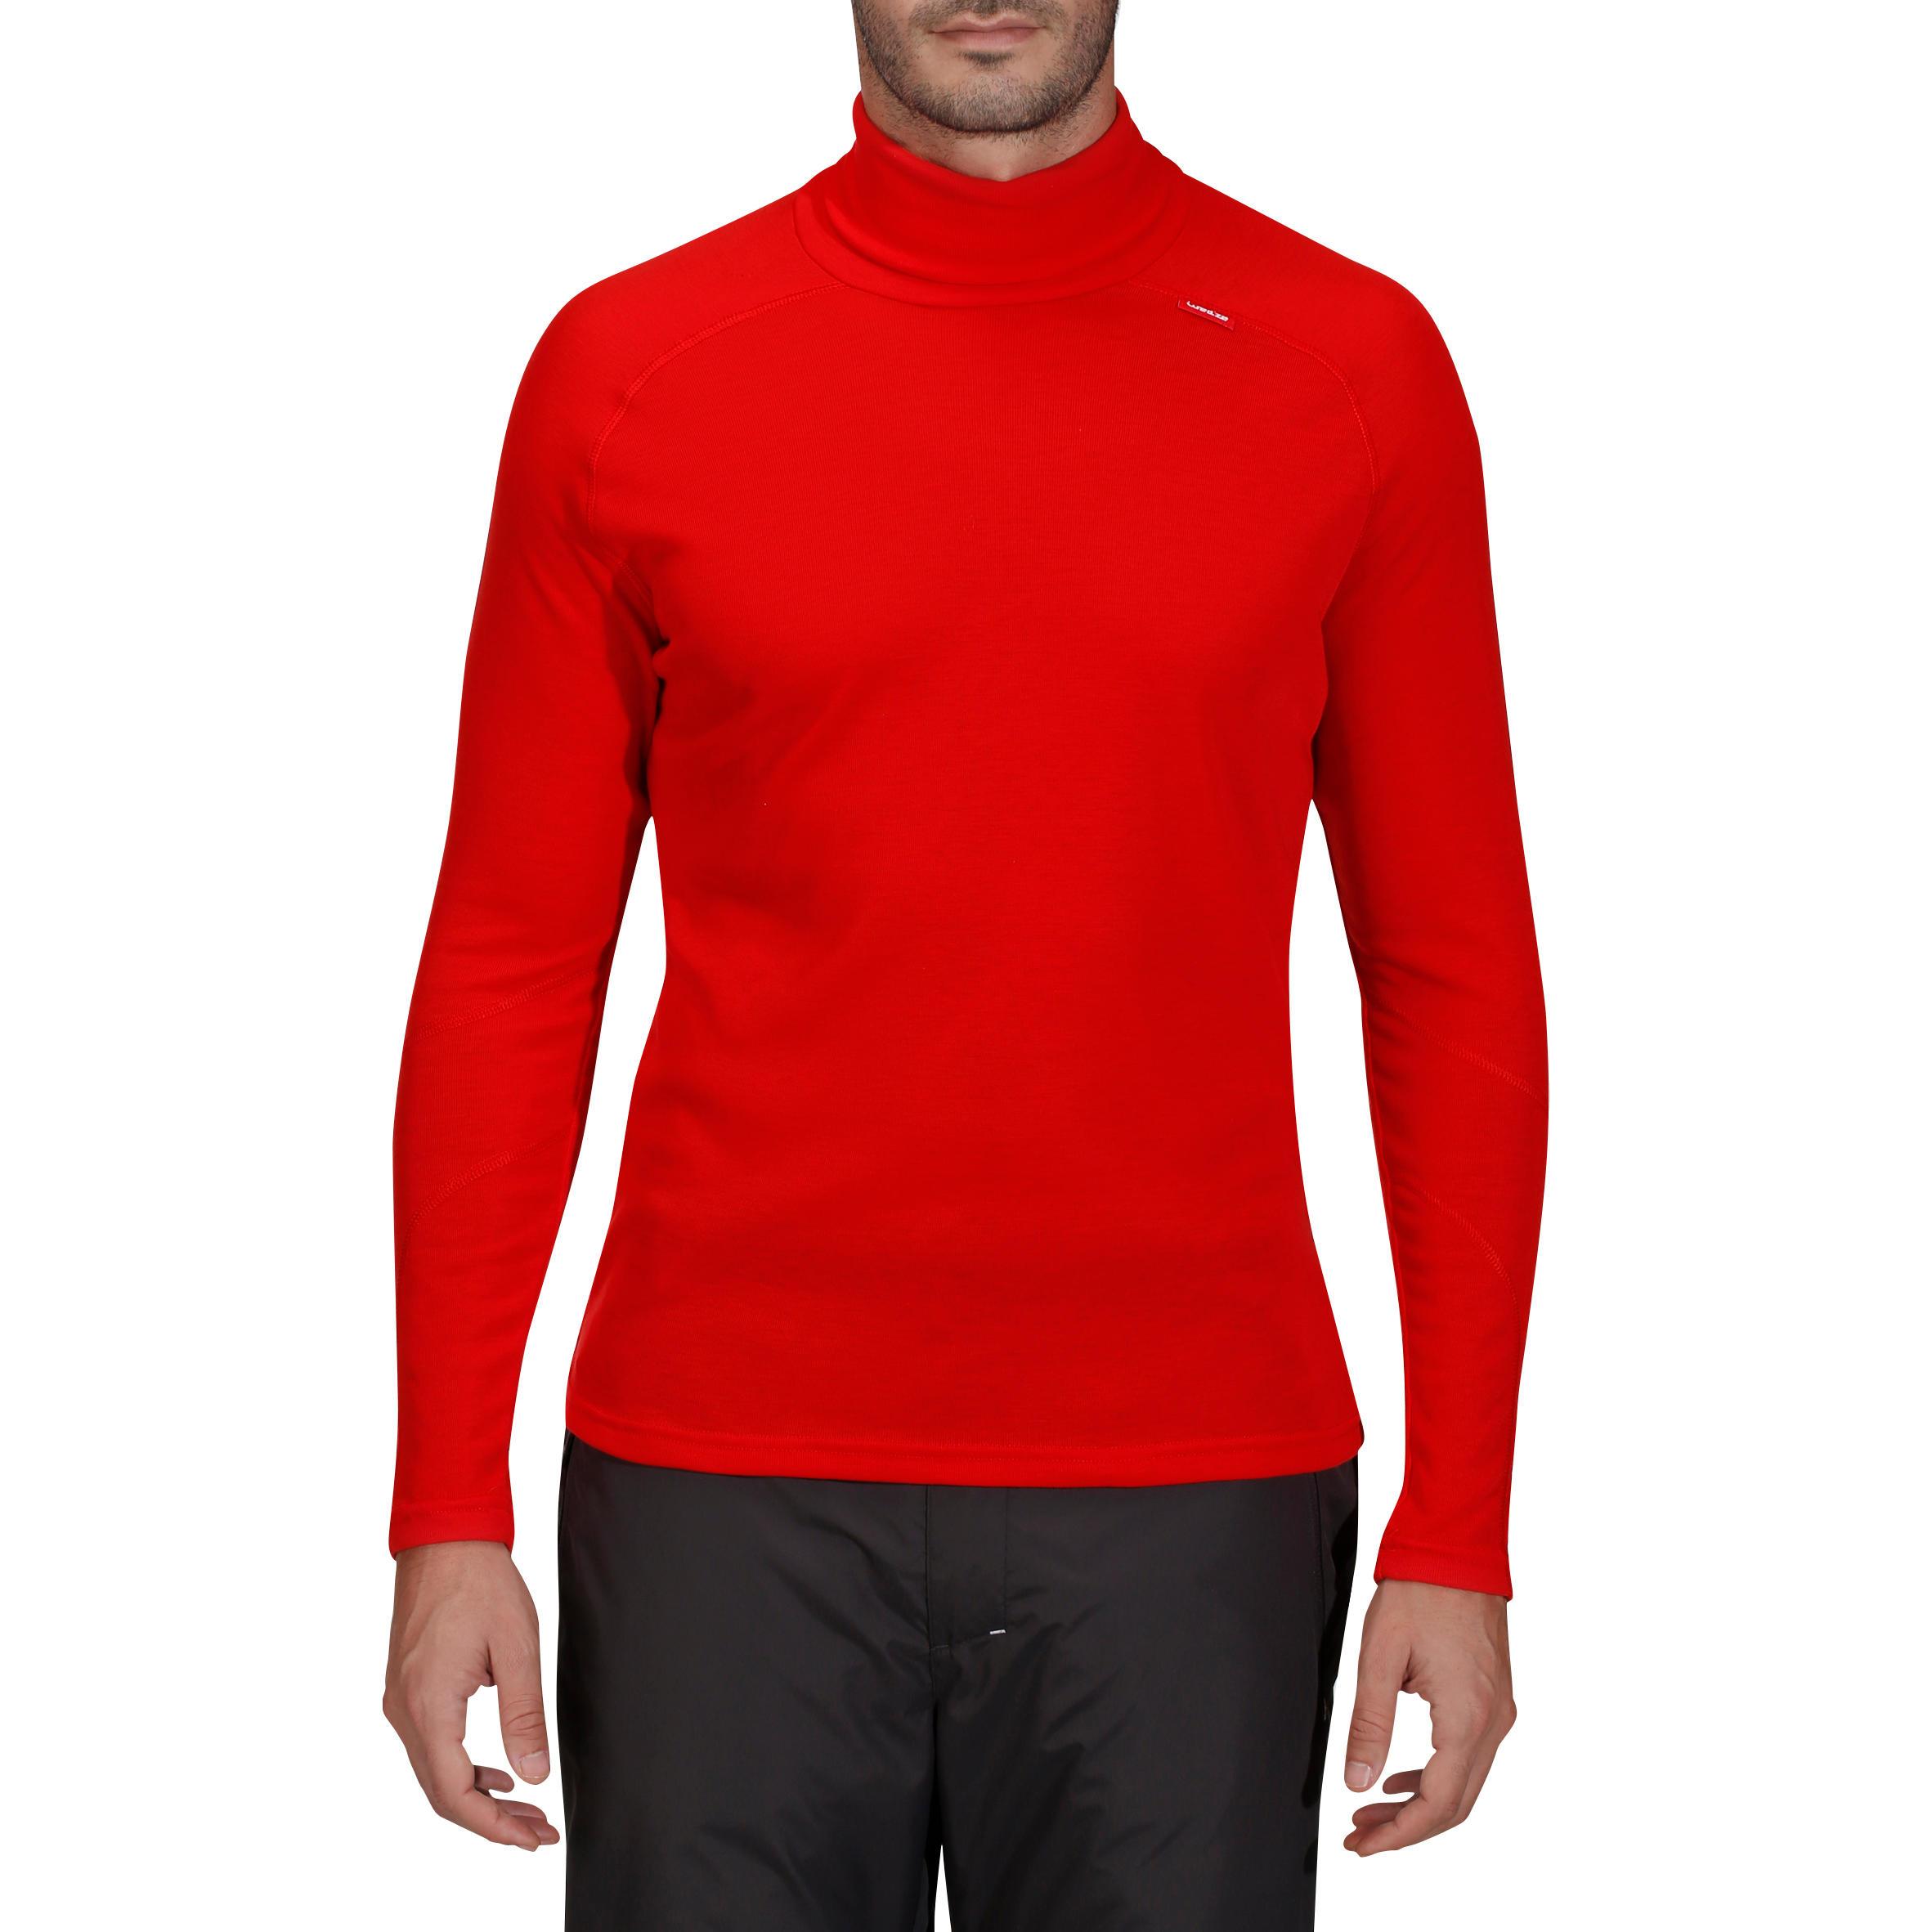 Sous Wed'ze Vêtement Col Homme Ski Roule Warm Simple Rouge vwnmNy08O